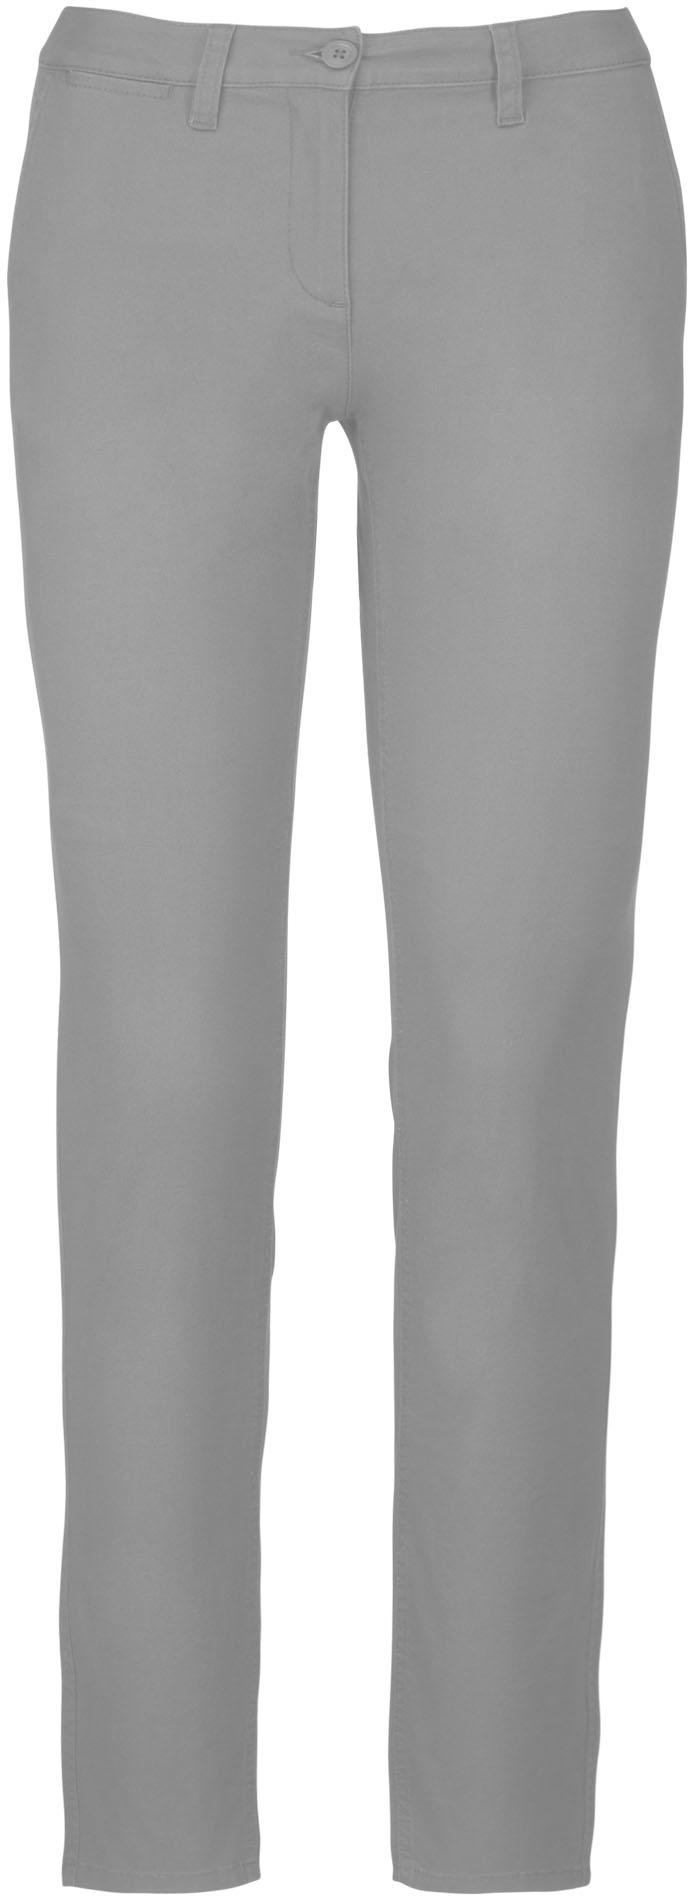 Pantalon chino femme - 2-1479-7